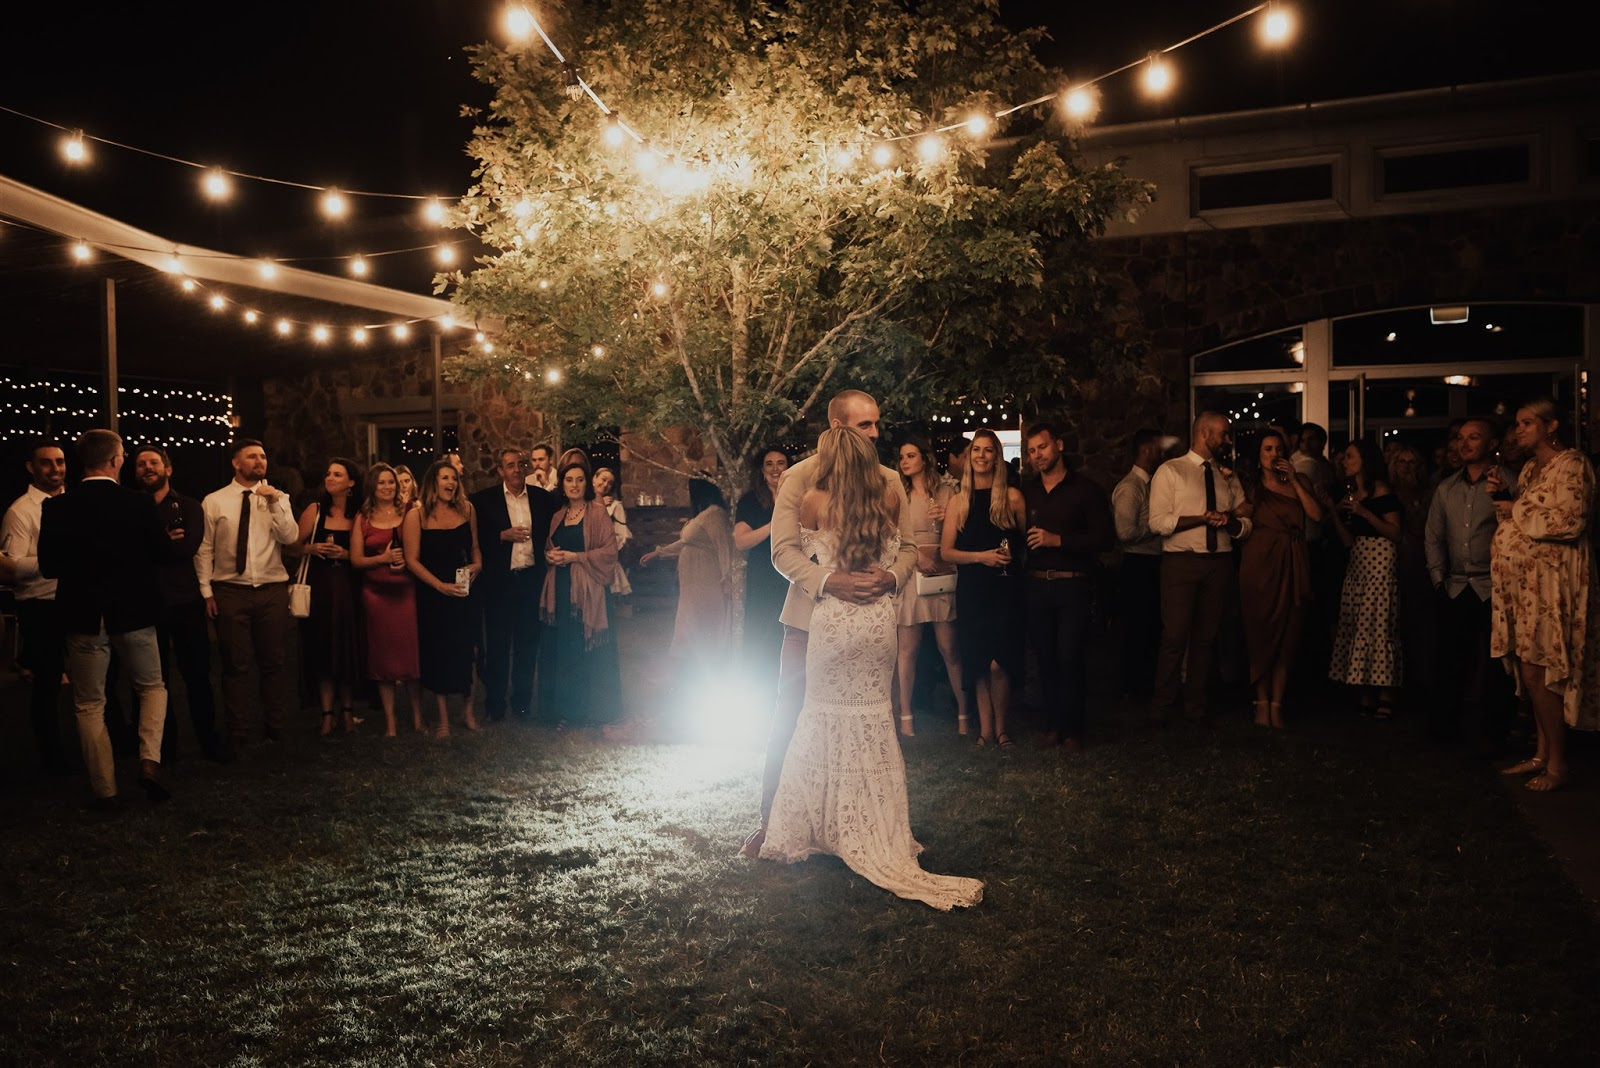 bird and boy photography weddings gold coast venue to the aisle australia